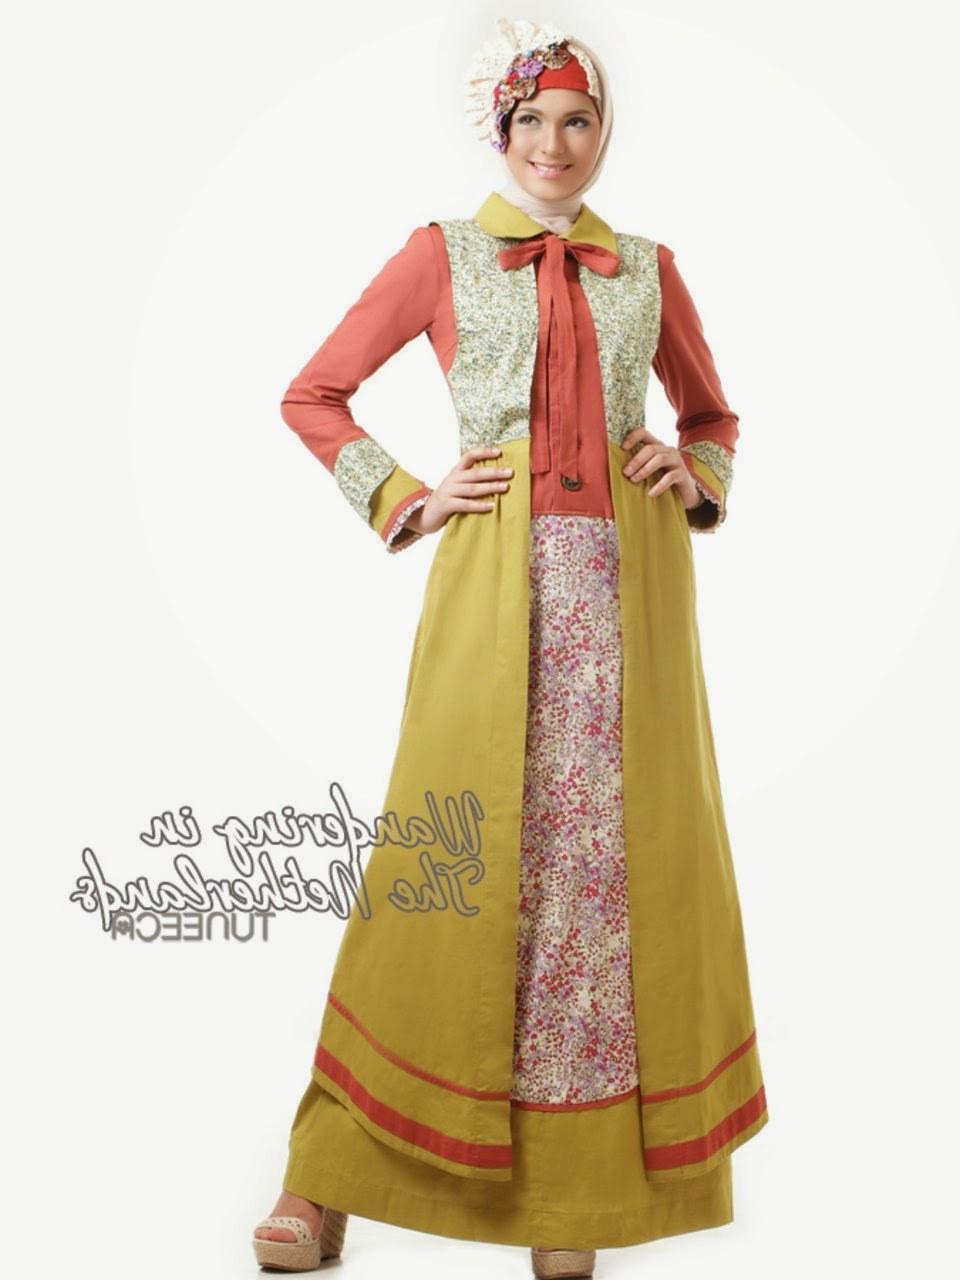 Design Gambar Baju Lebaran 9fdy 12 Contoh Model Gamis Muslim Lebaran Terbaru Kumpulan